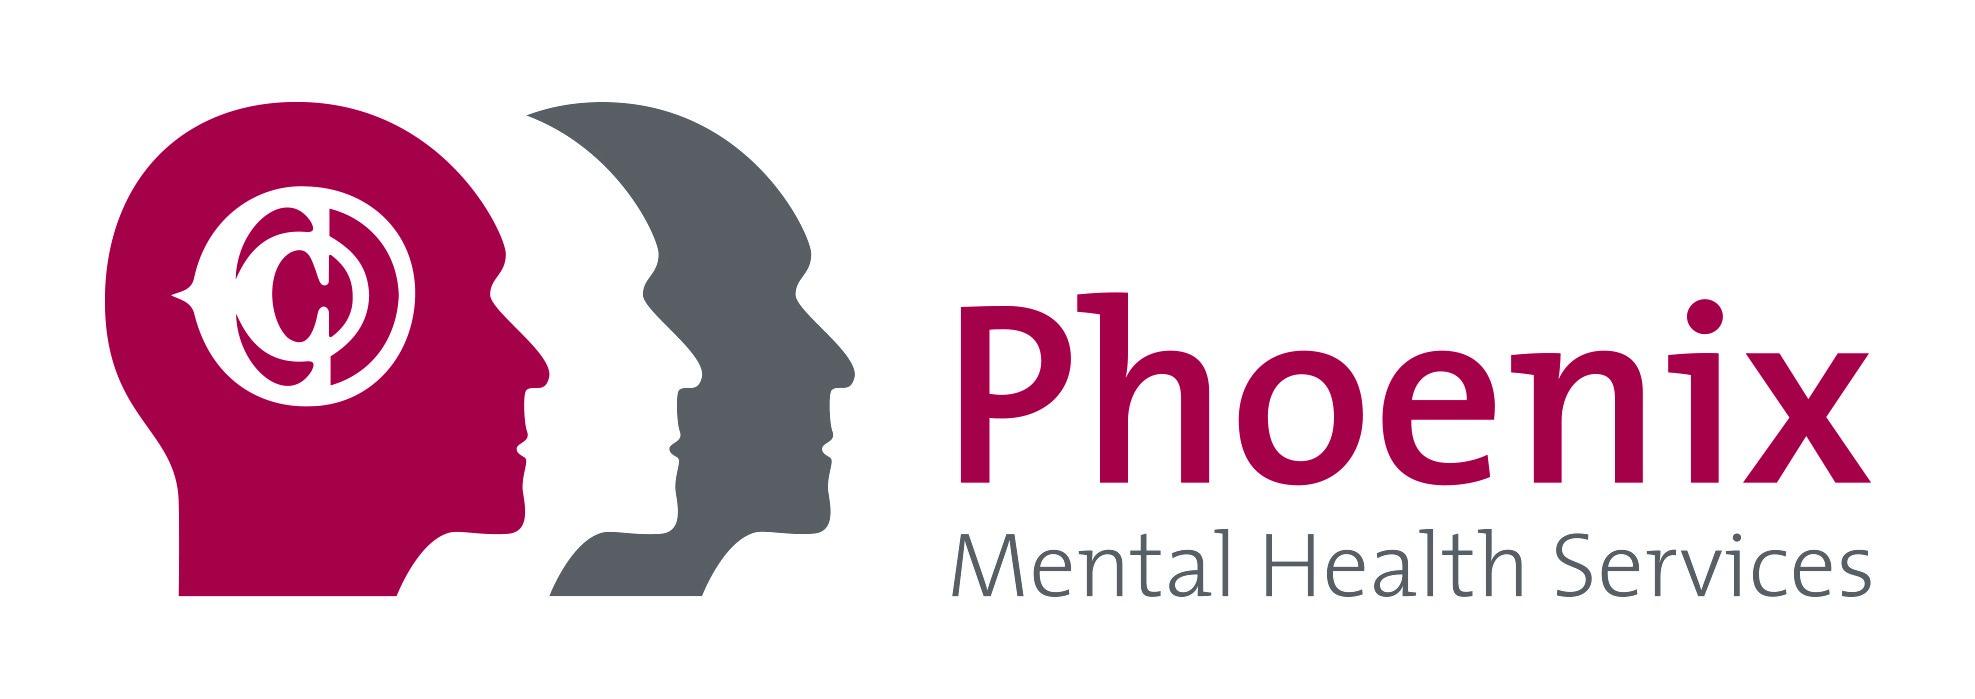 Phoenix Mental Health Services